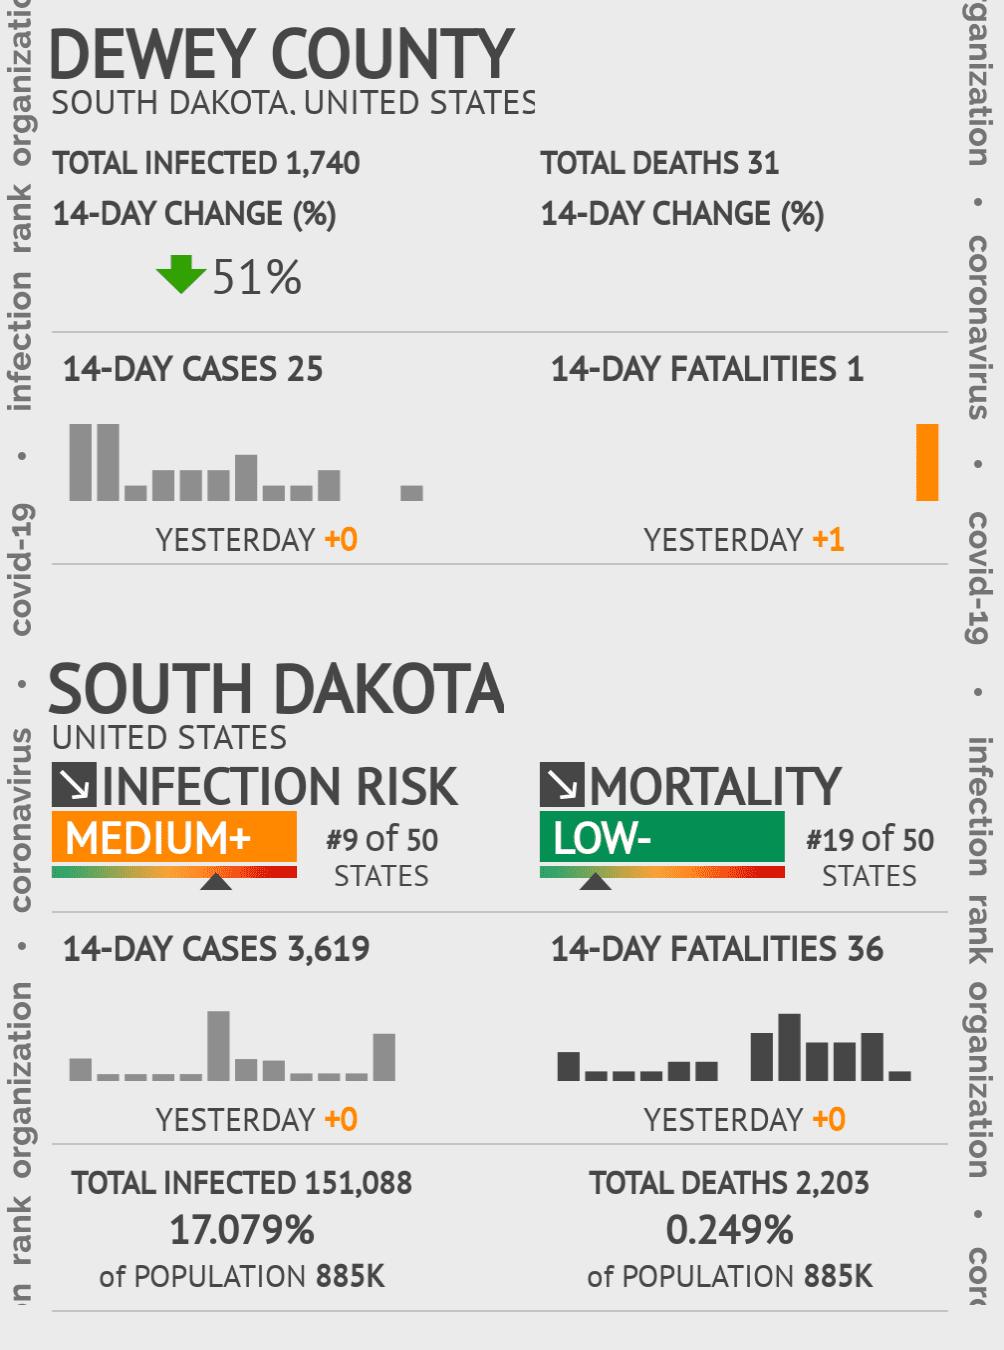 Dewey County Coronavirus Covid-19 Risk of Infection on July 24, 2021